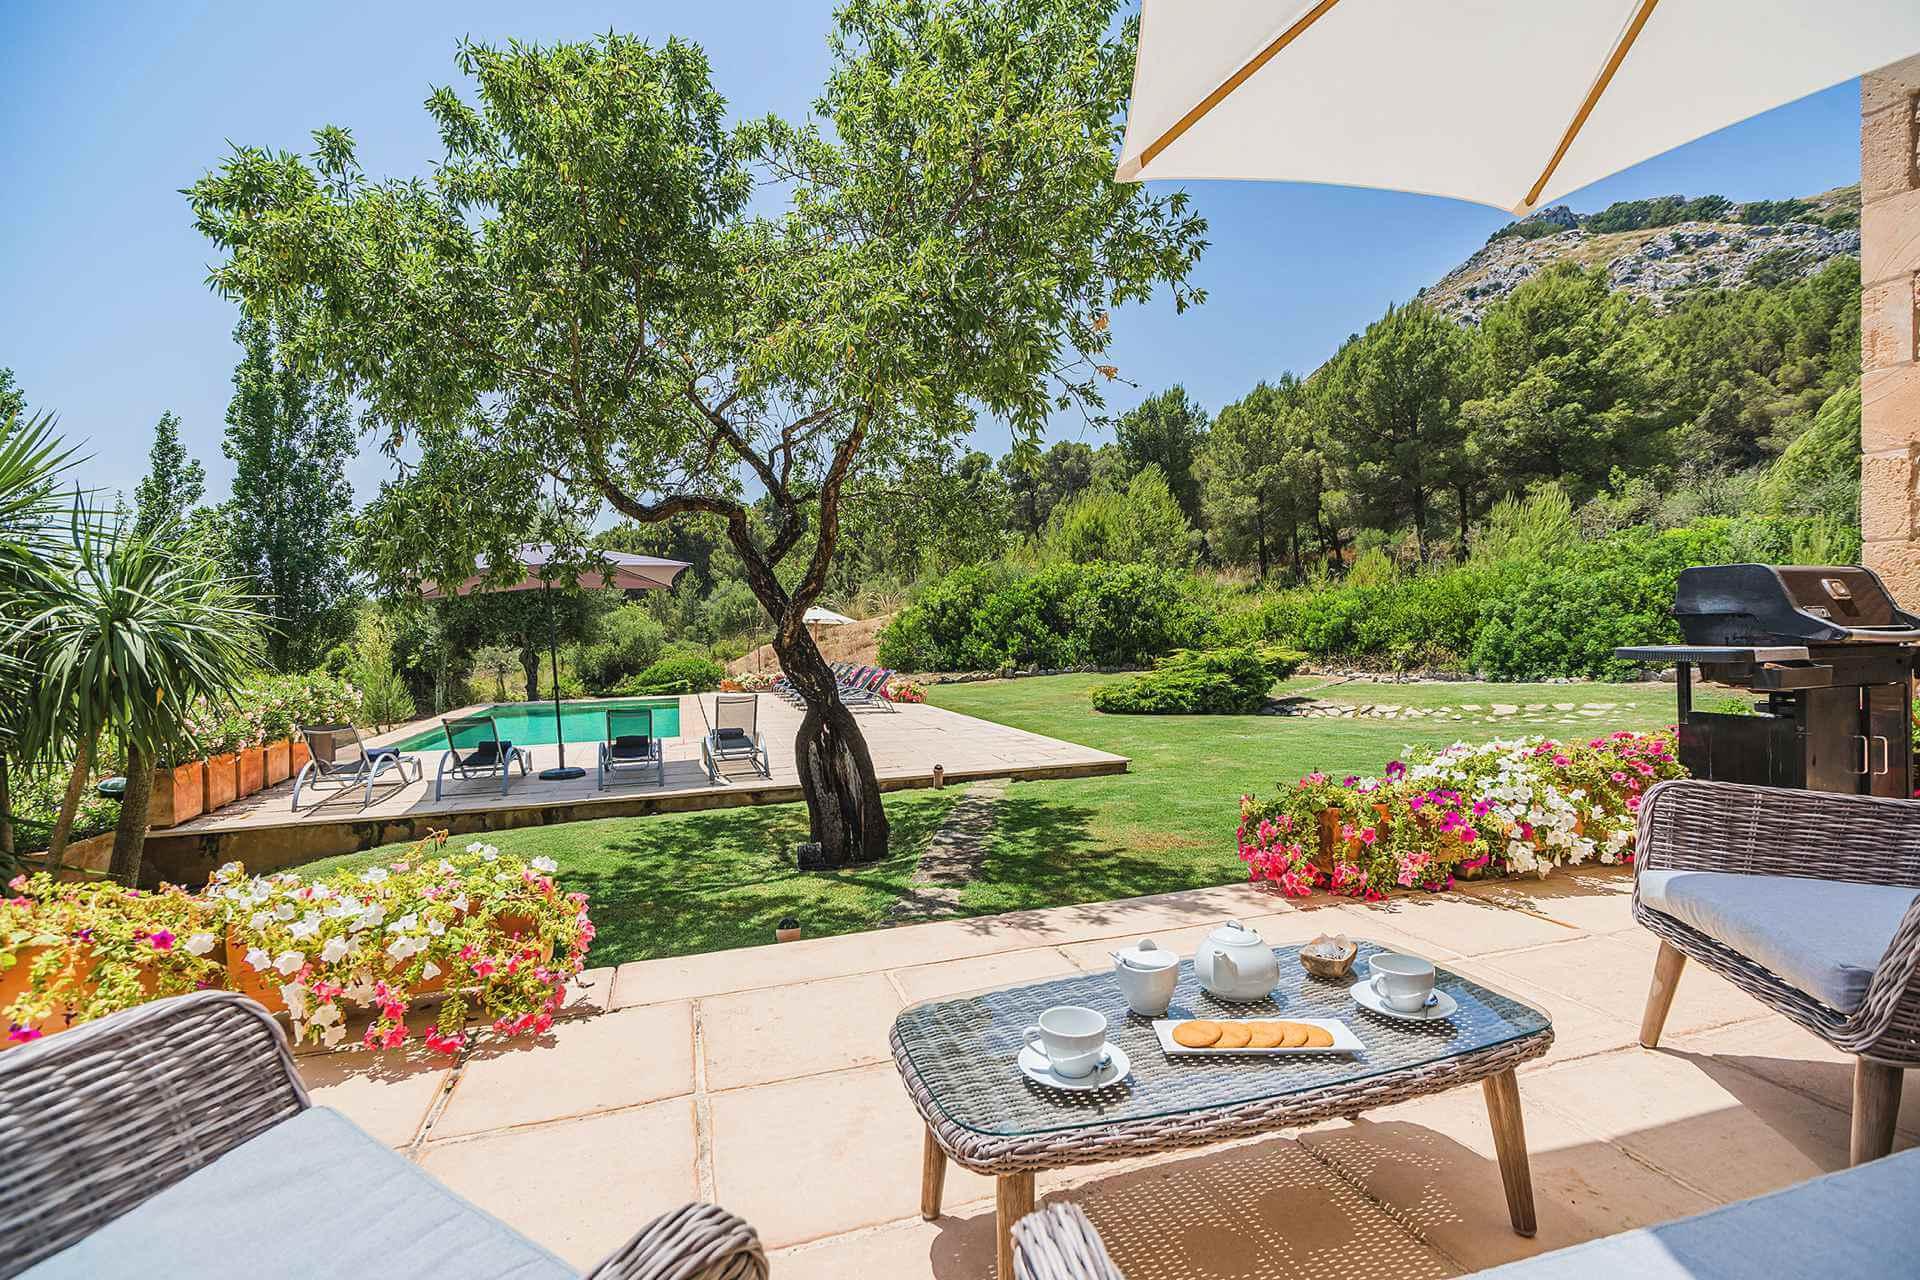 01-348 Luxury Family Finca Mallorca North Bild 5